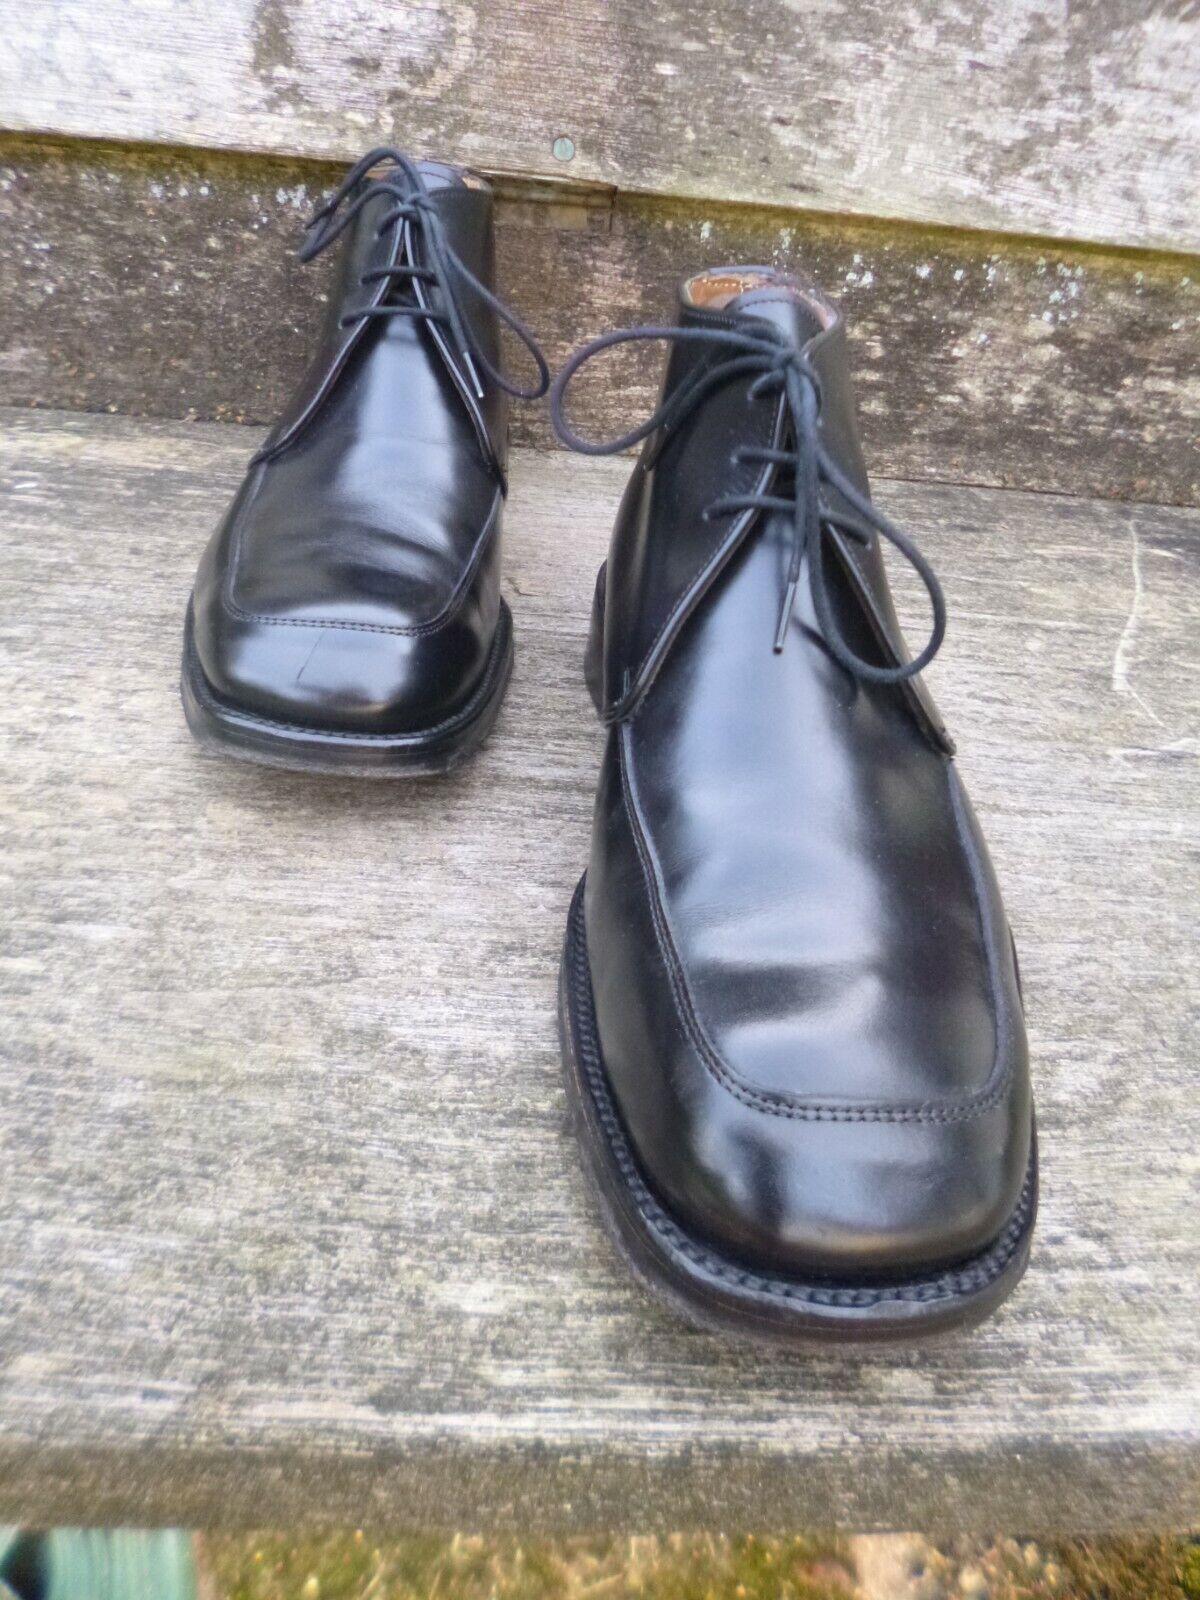 Cheaney Negro botas Caballeros – – – Excelentes Condiciones